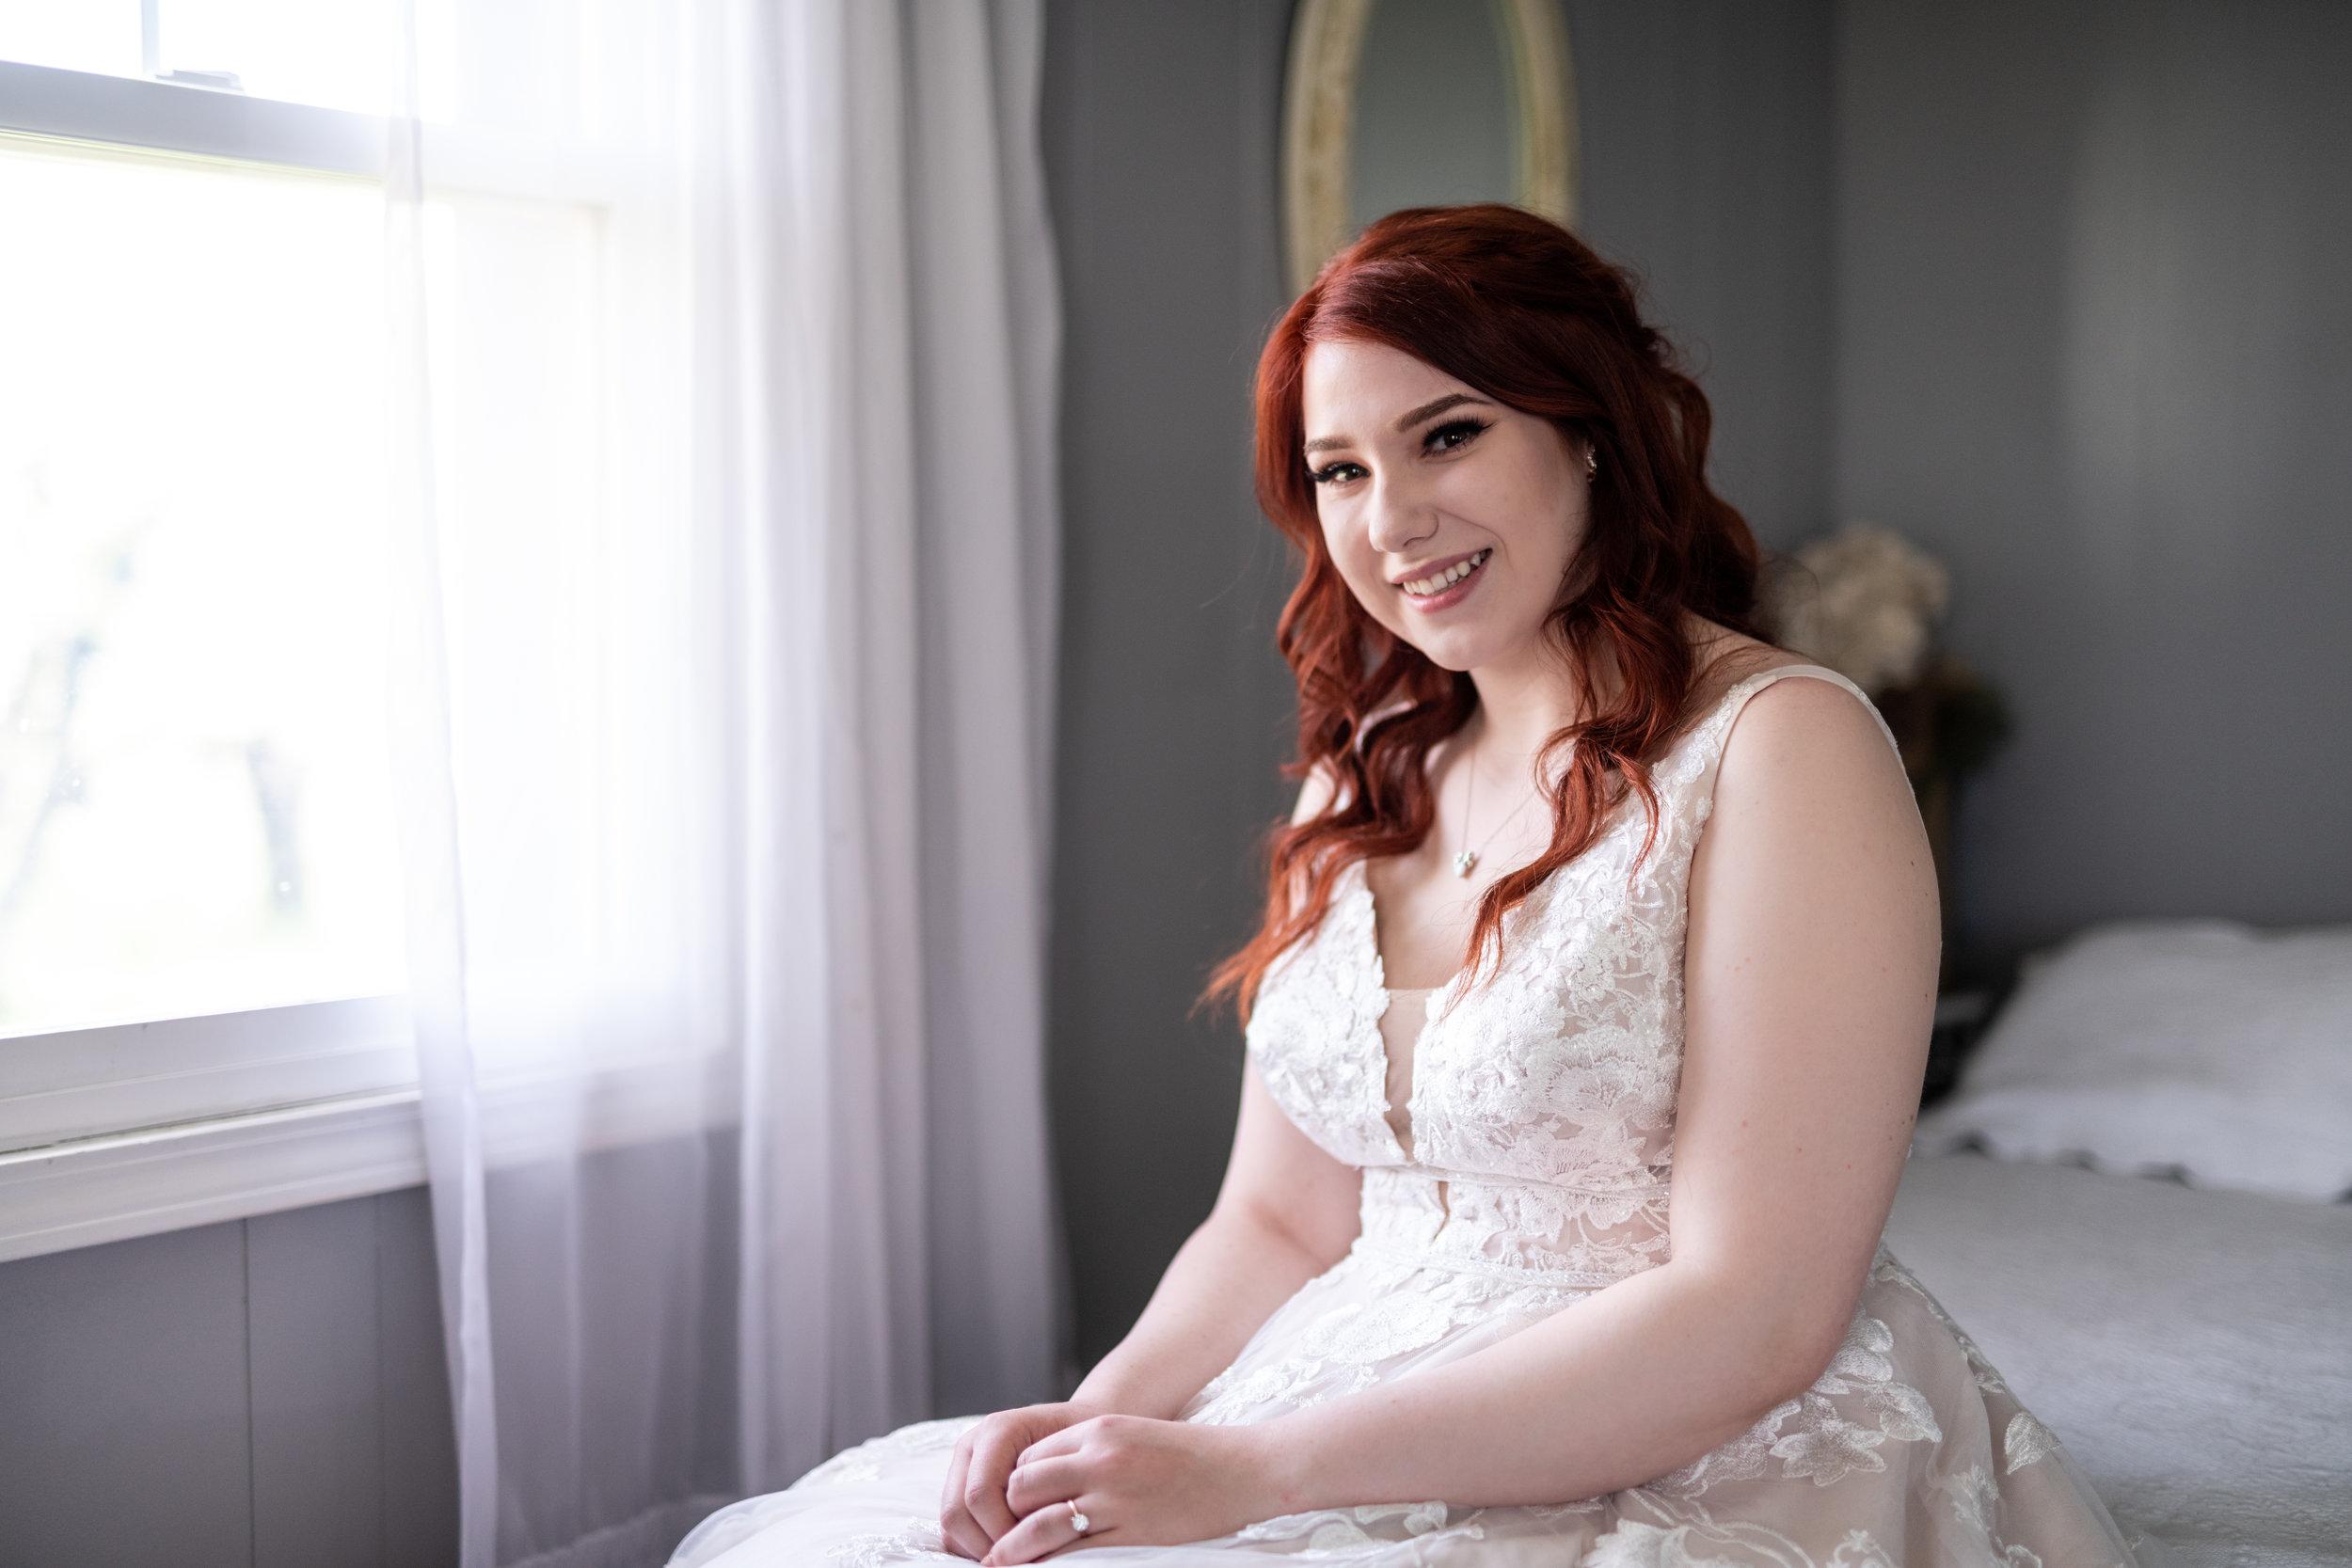 Spokane green bluff wedding dress bride